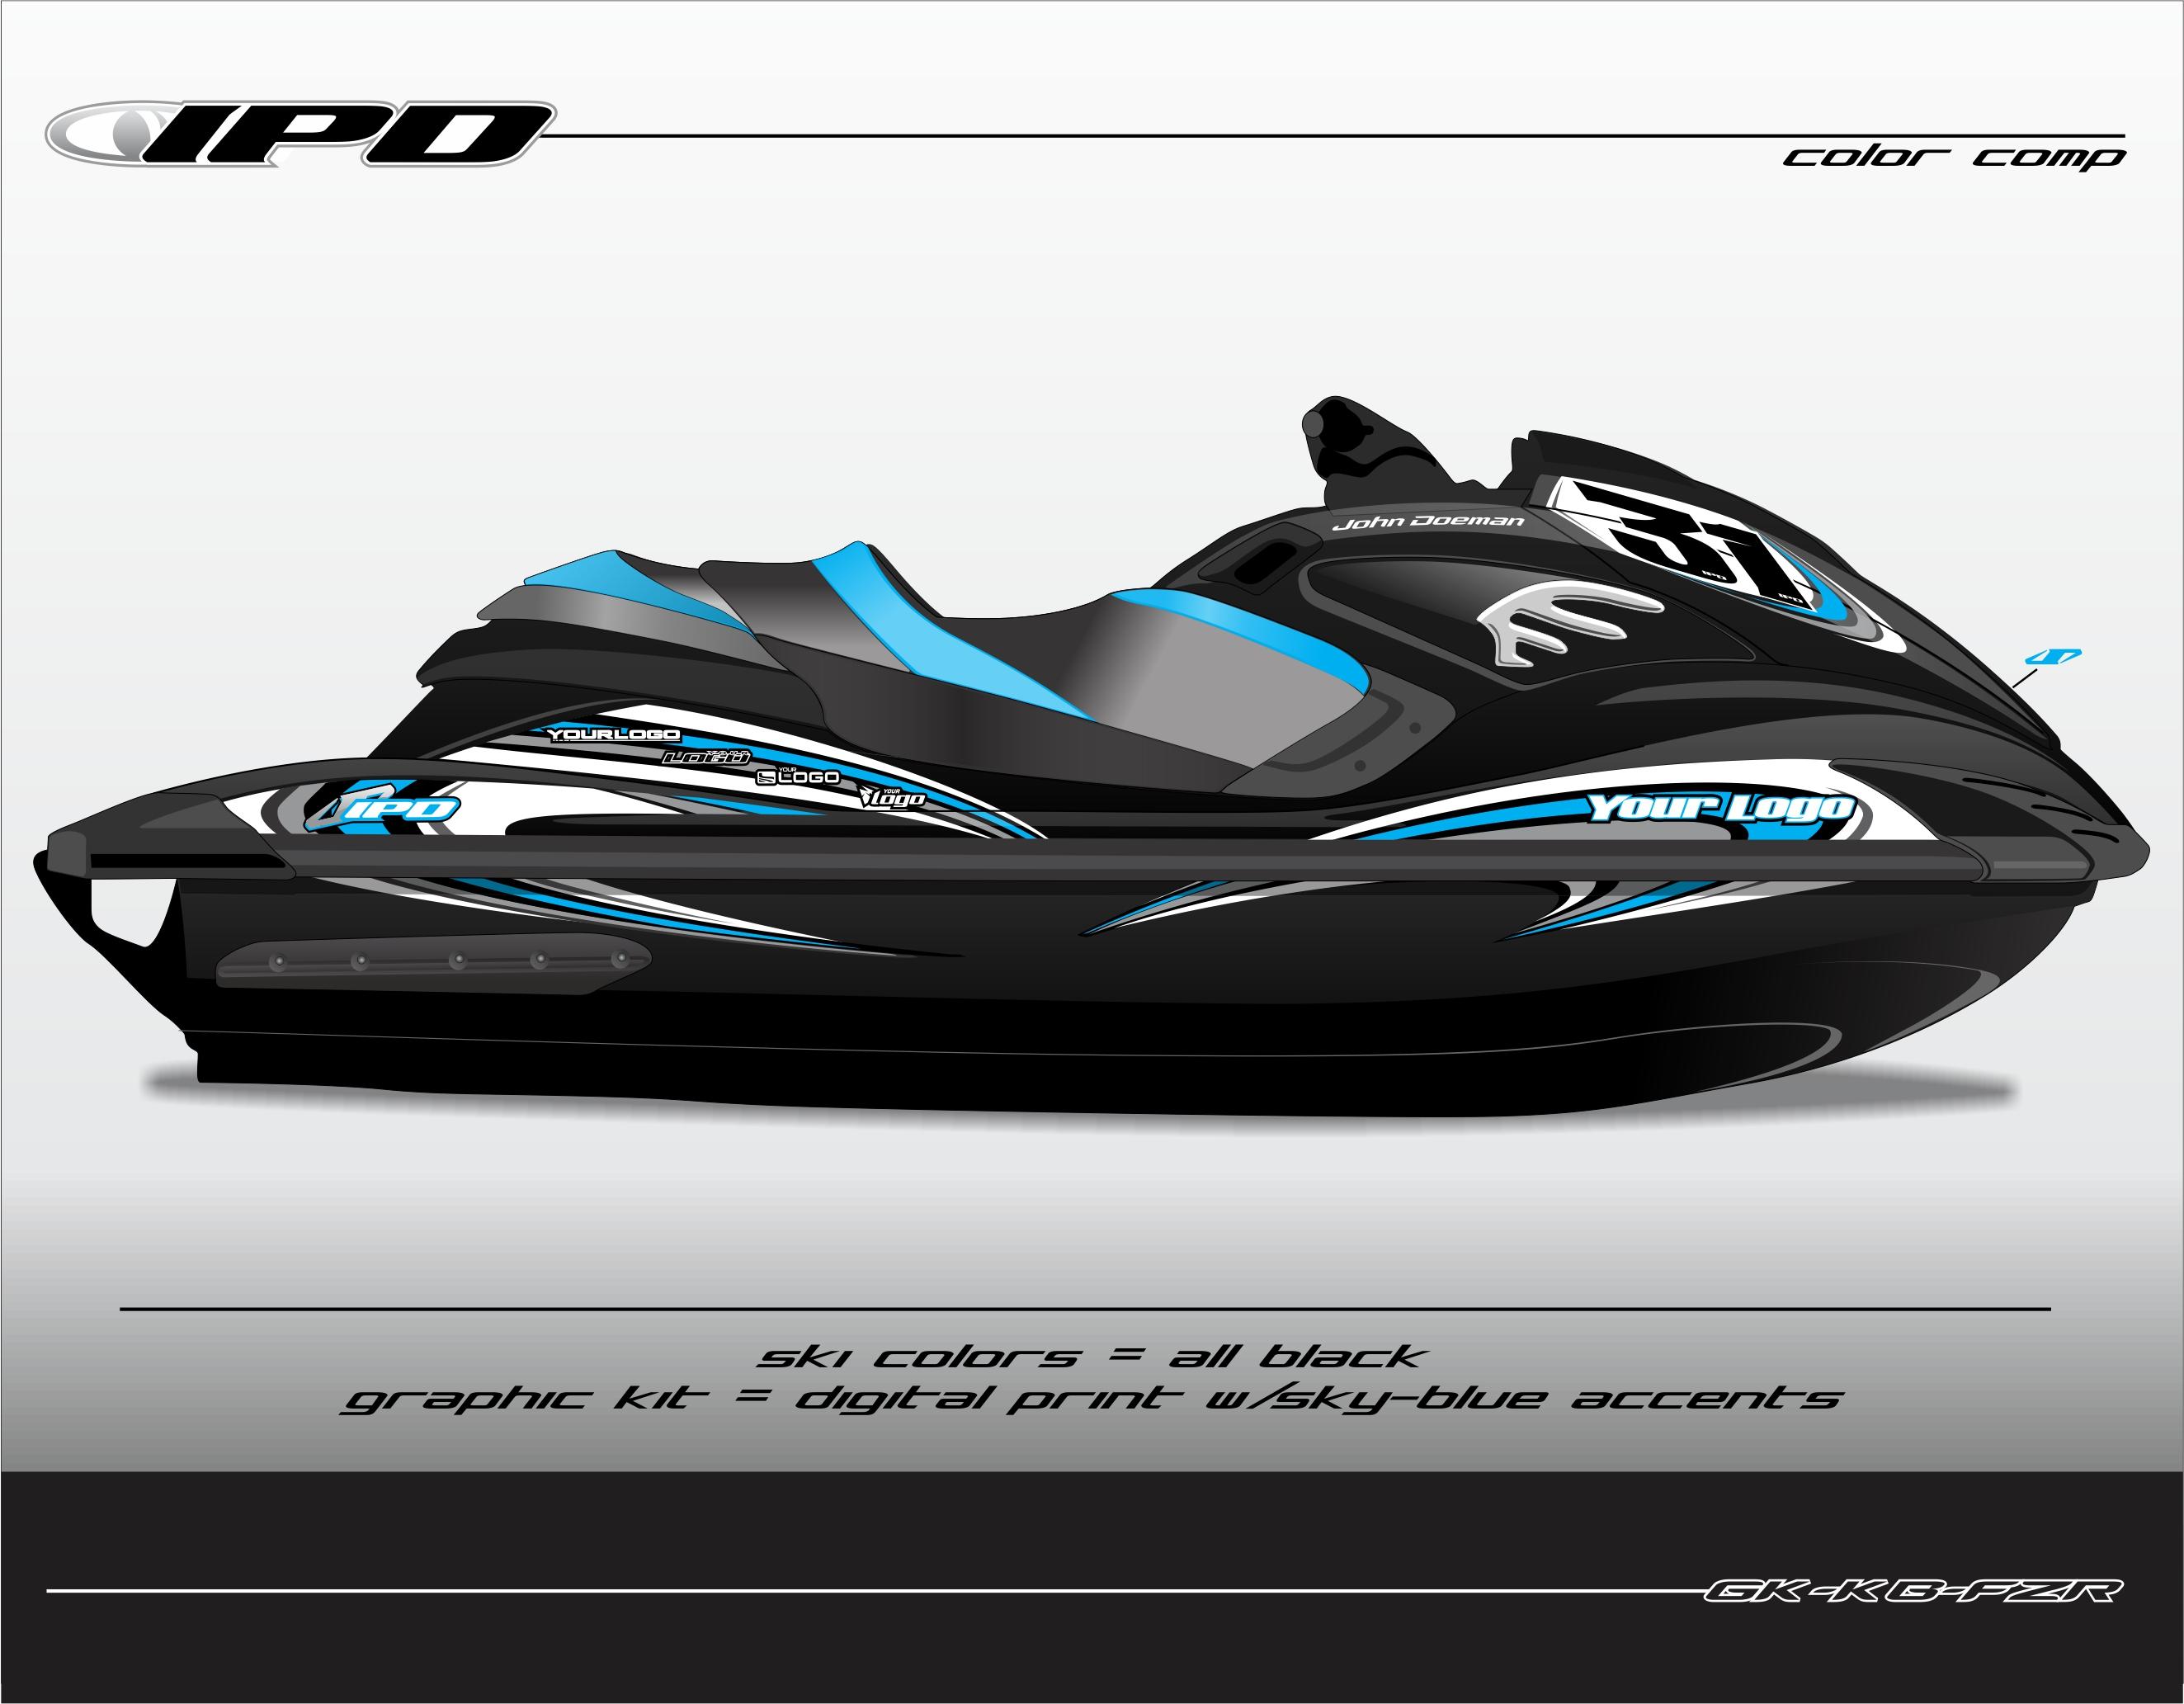 Yamaha fzs fzr graphics kit kb design ipd jet ski for Yamaha jet skis